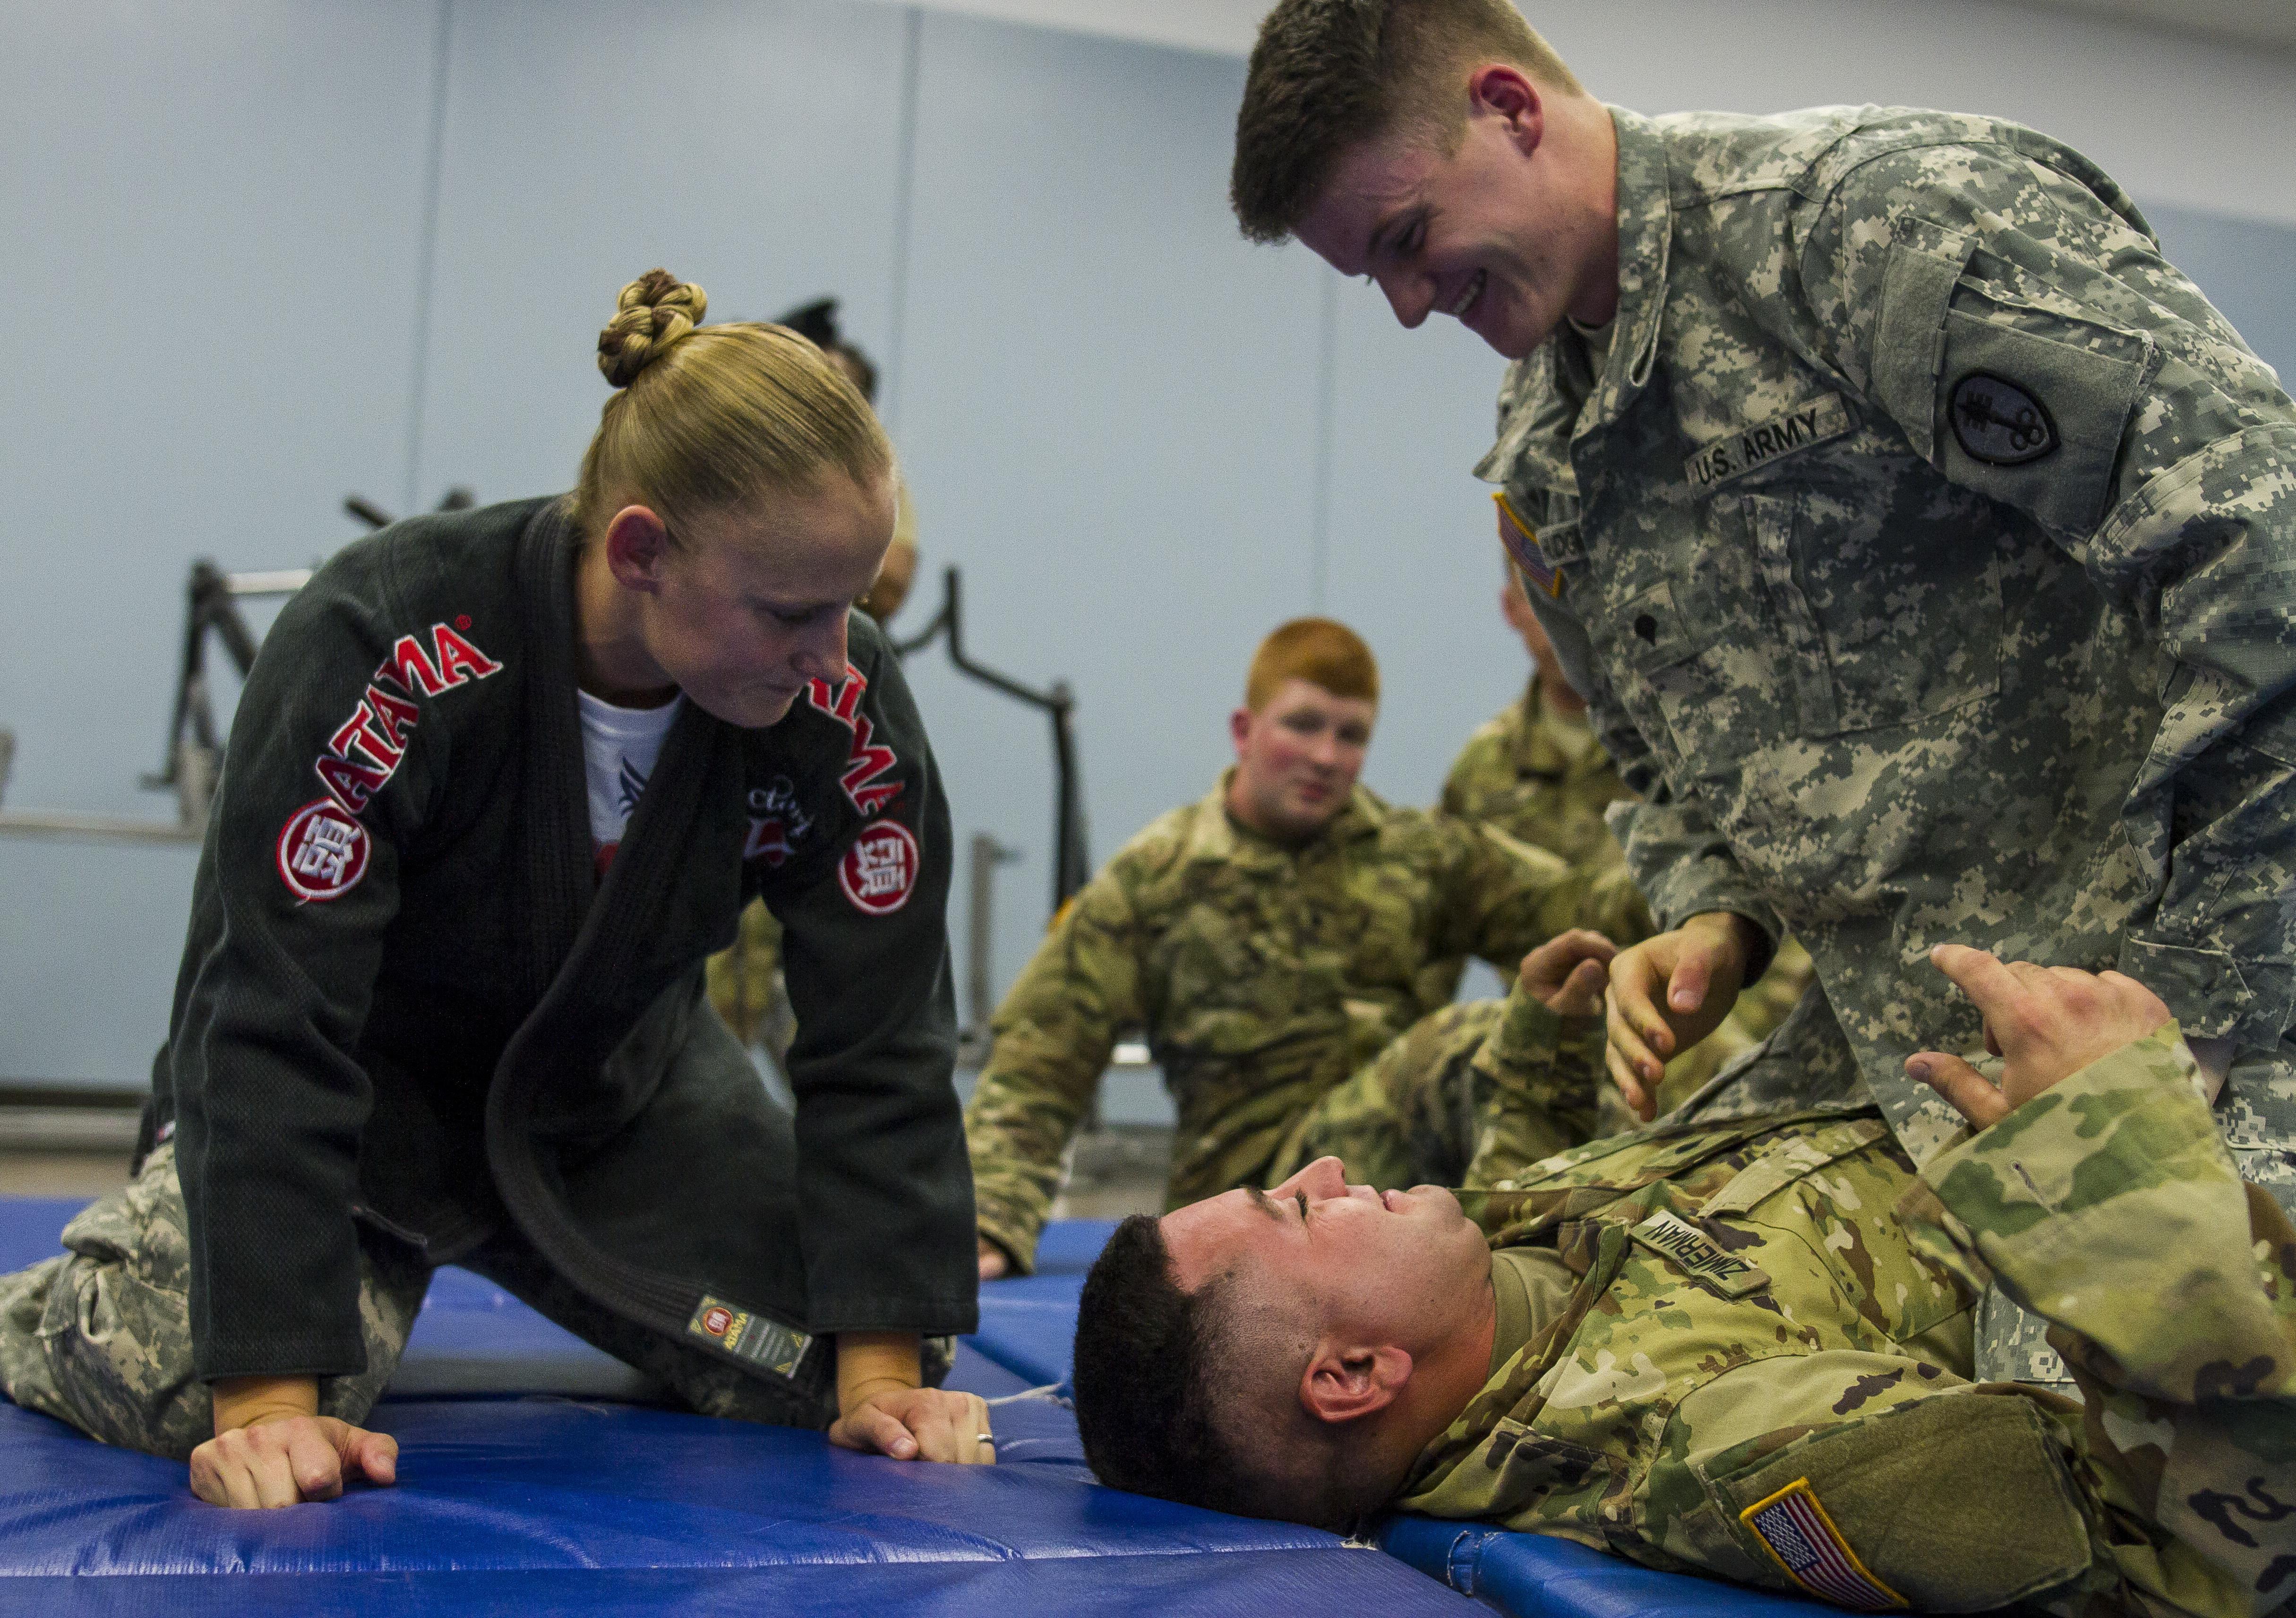 Triple Threat Female Army Reserve Soldier Is A True American Badass